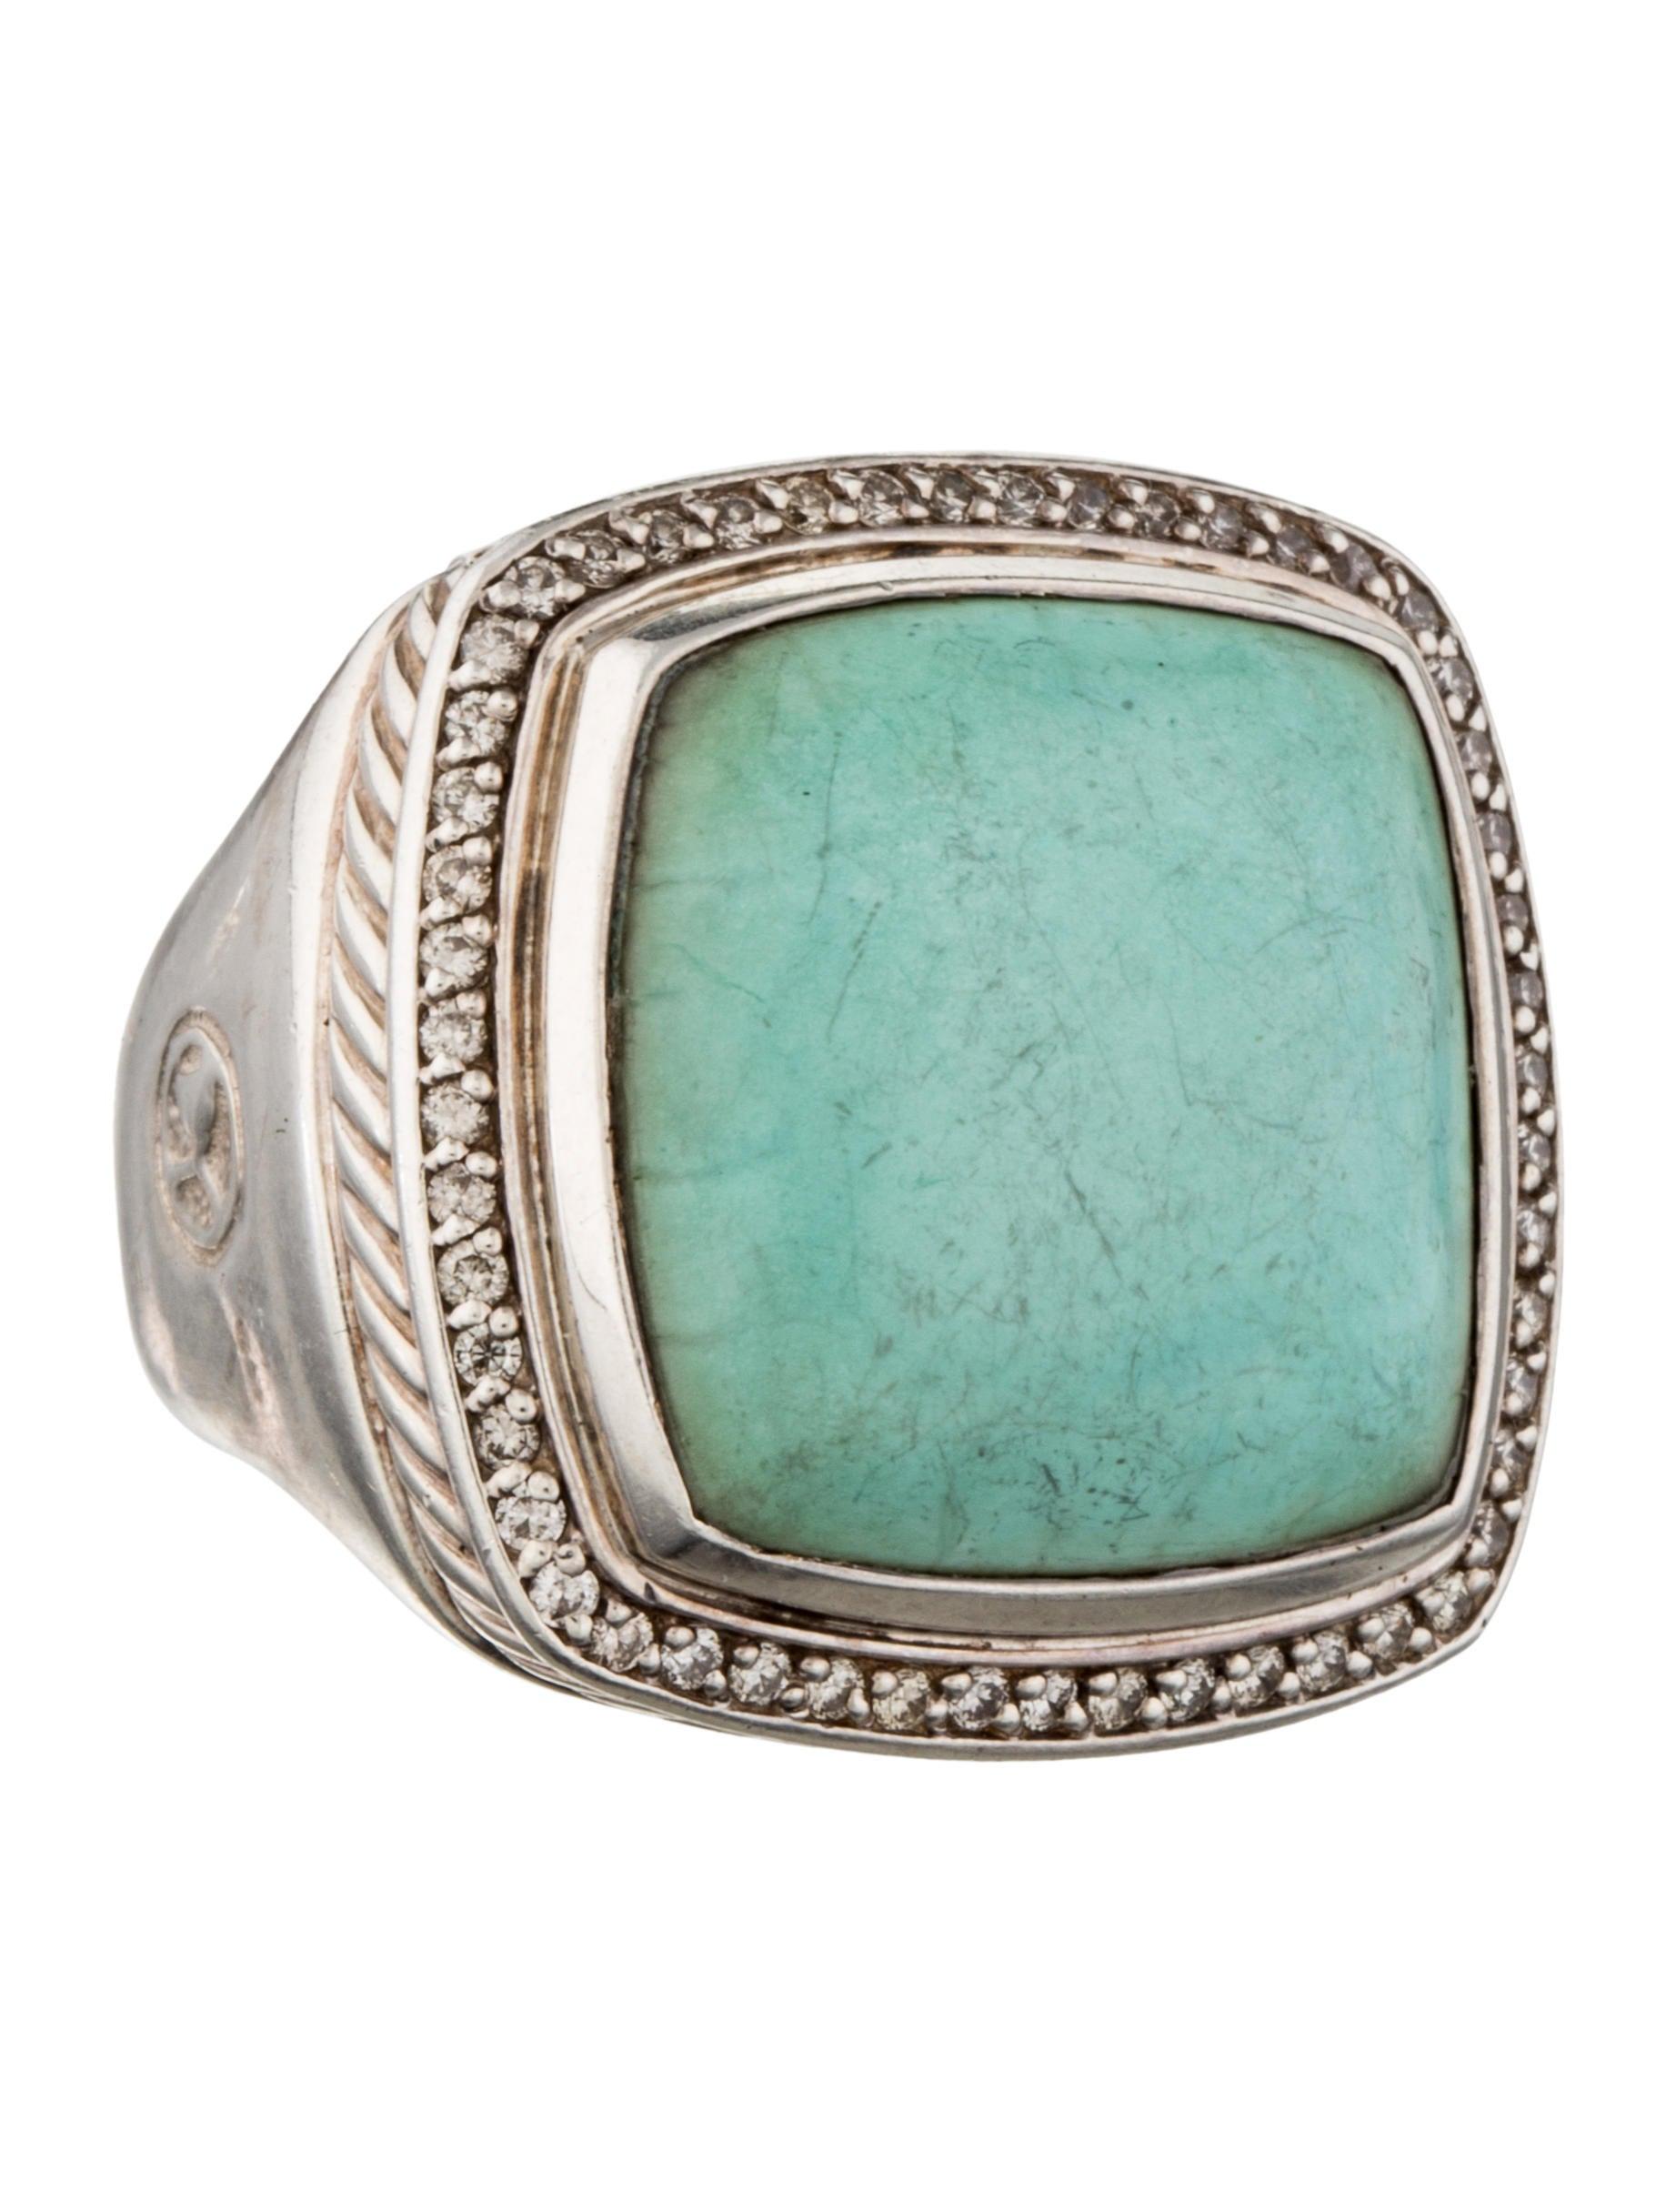 David yurman turquoise albion ring rings dvy28647 for David yurman inspired jewelry rings